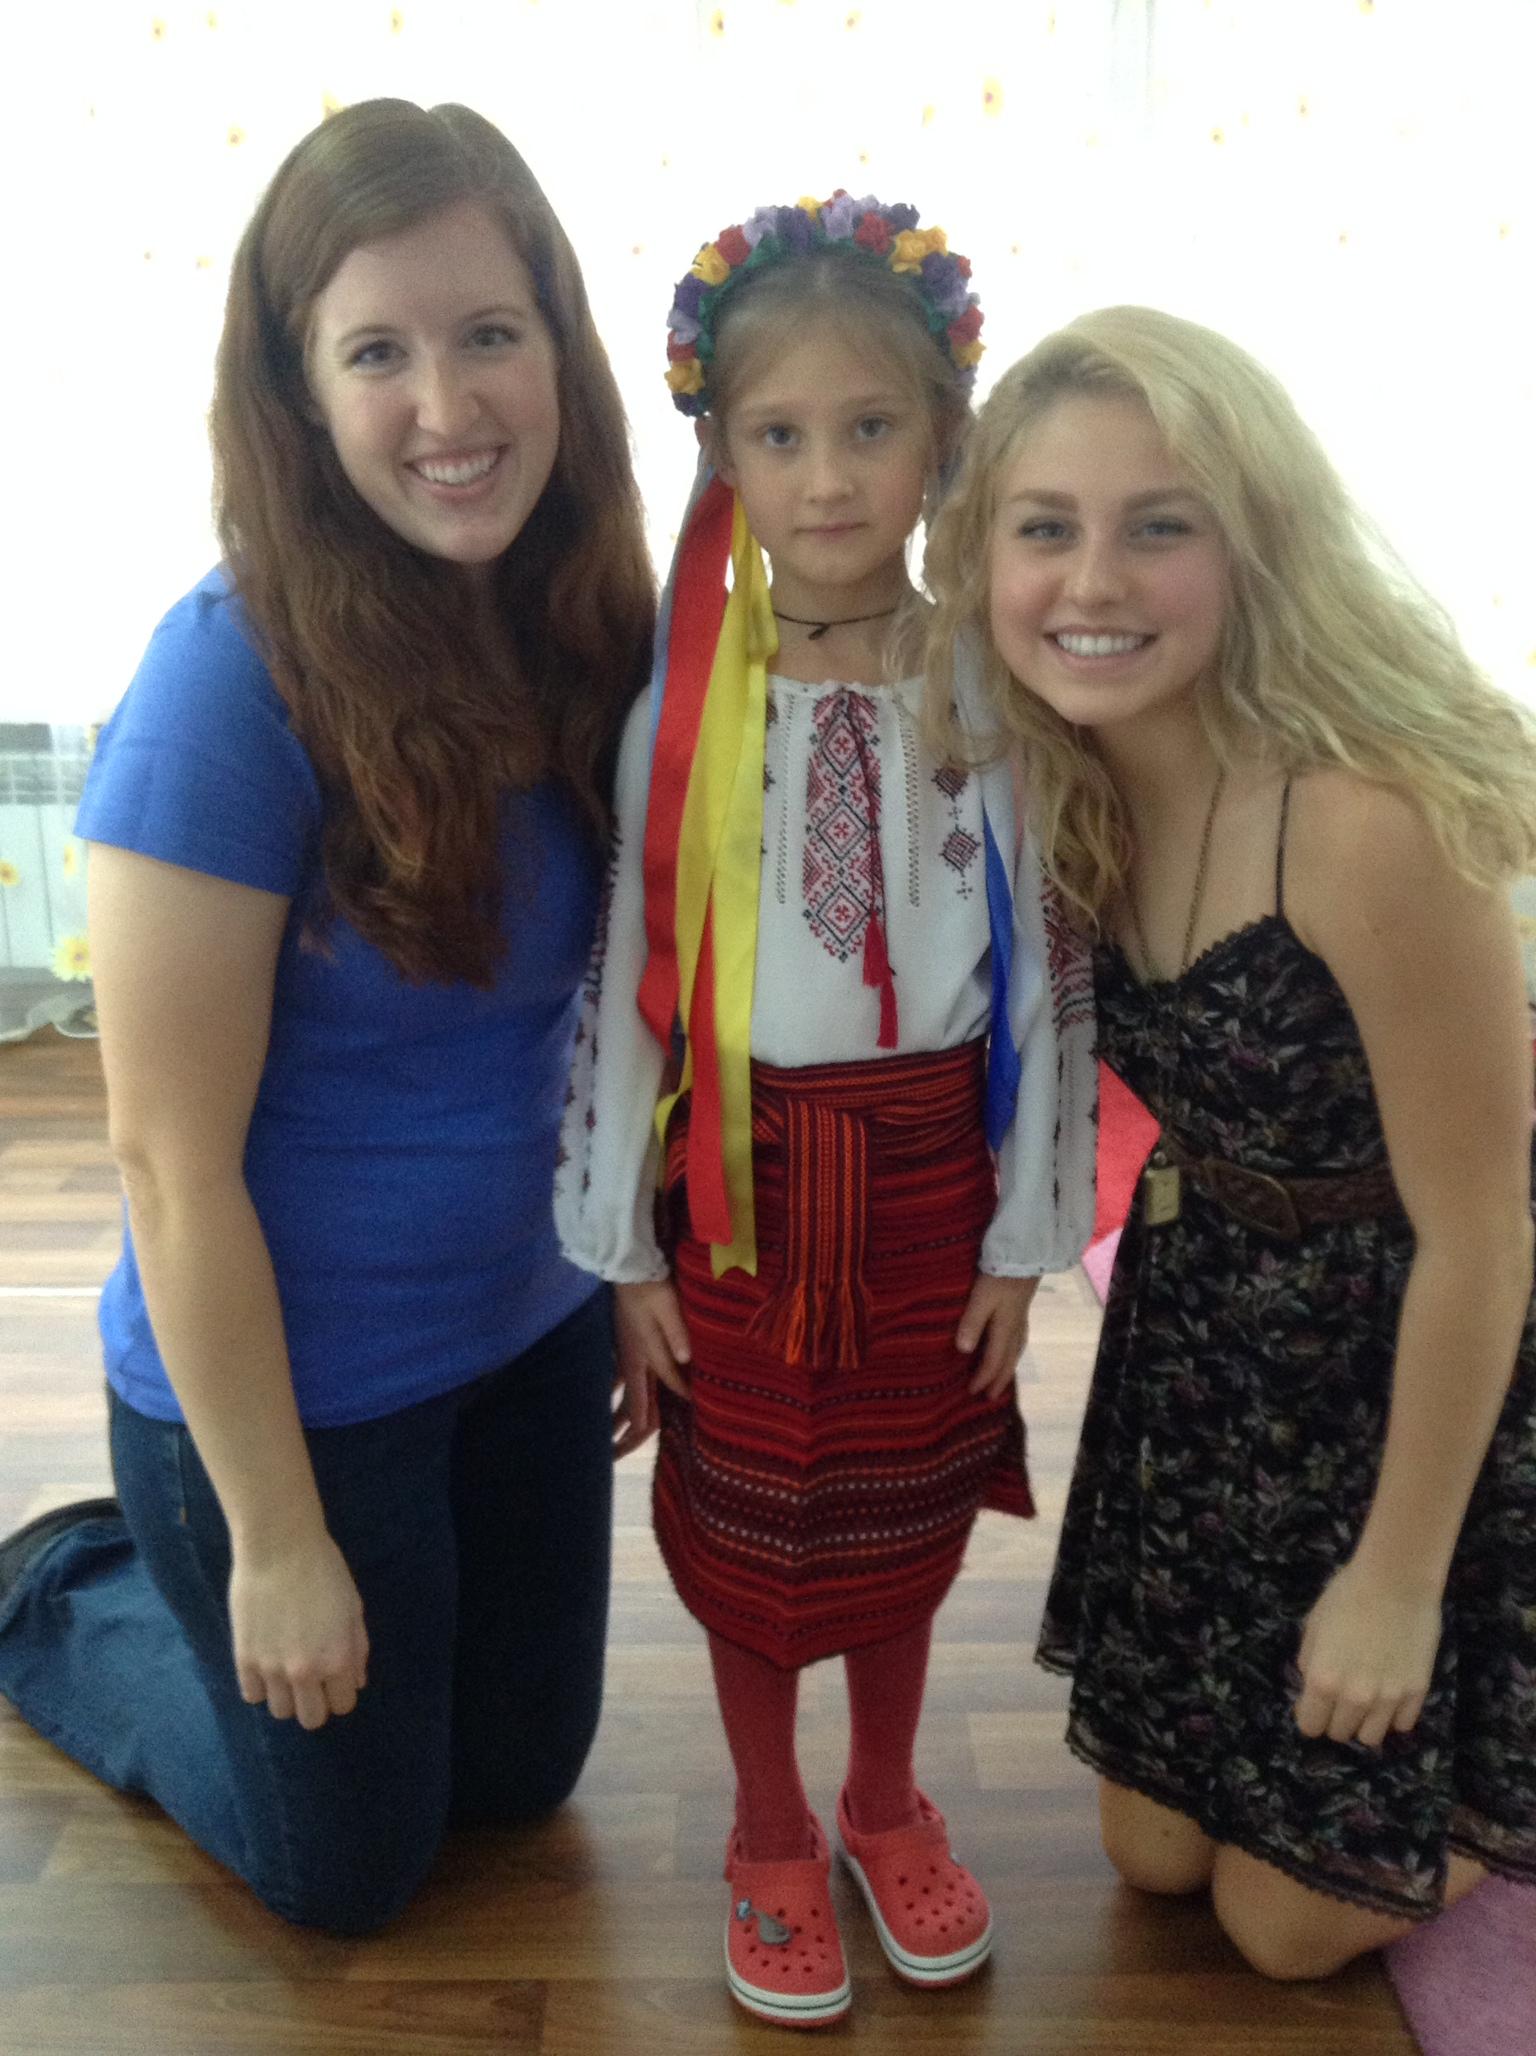 Ukrainian_girl_traditional_dress-1